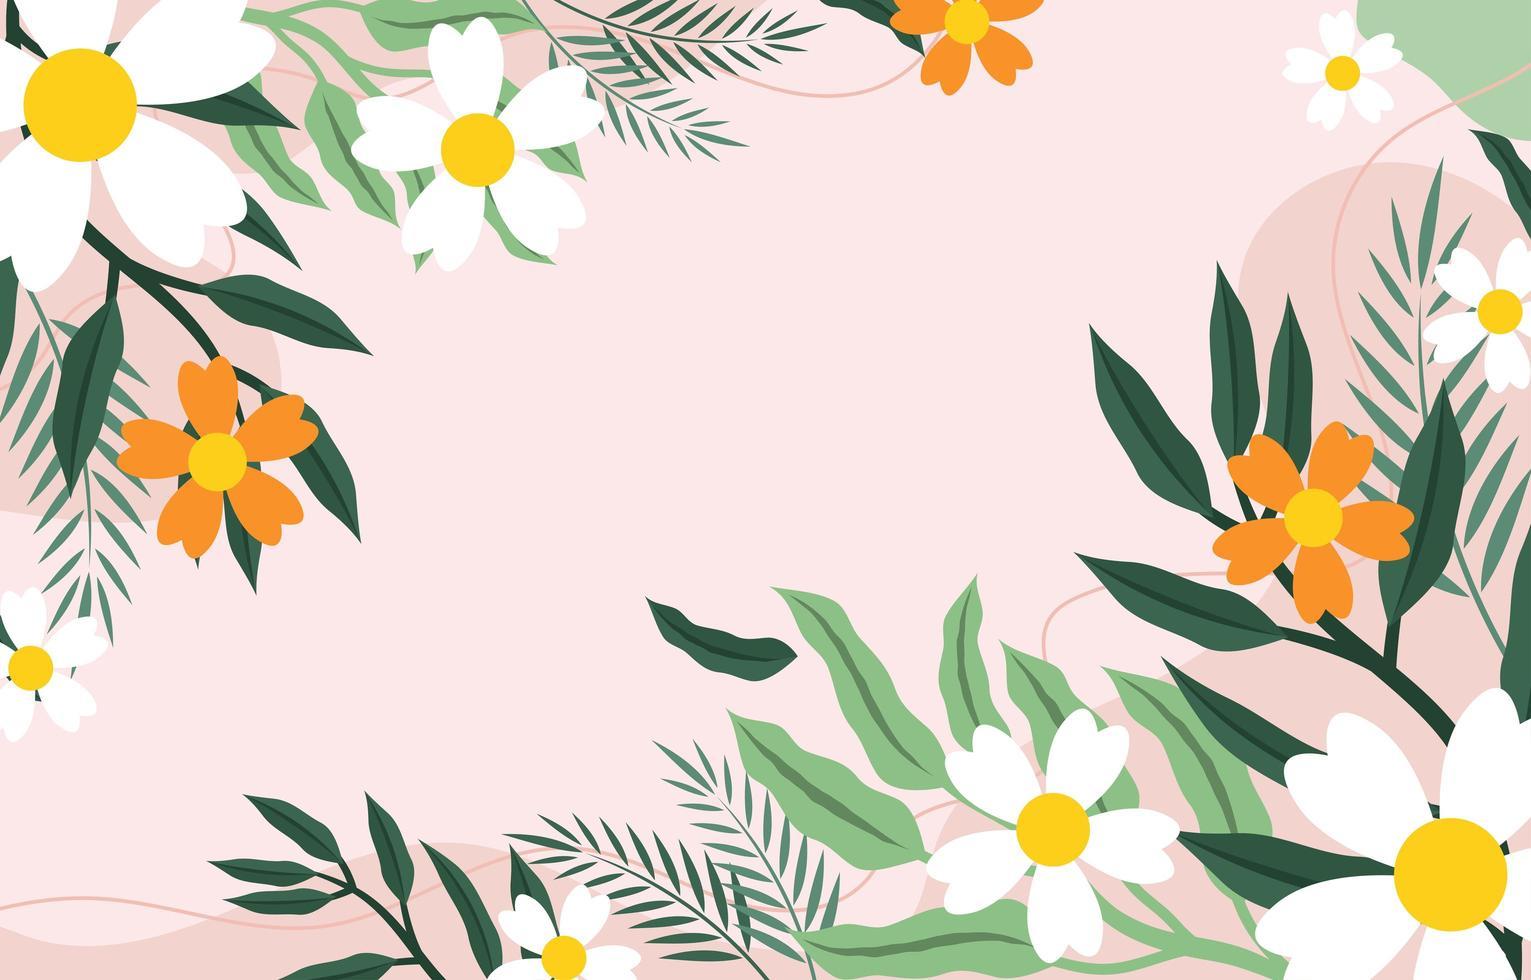 groene kleur van foliages plat ontwerp als achtergrond, vector